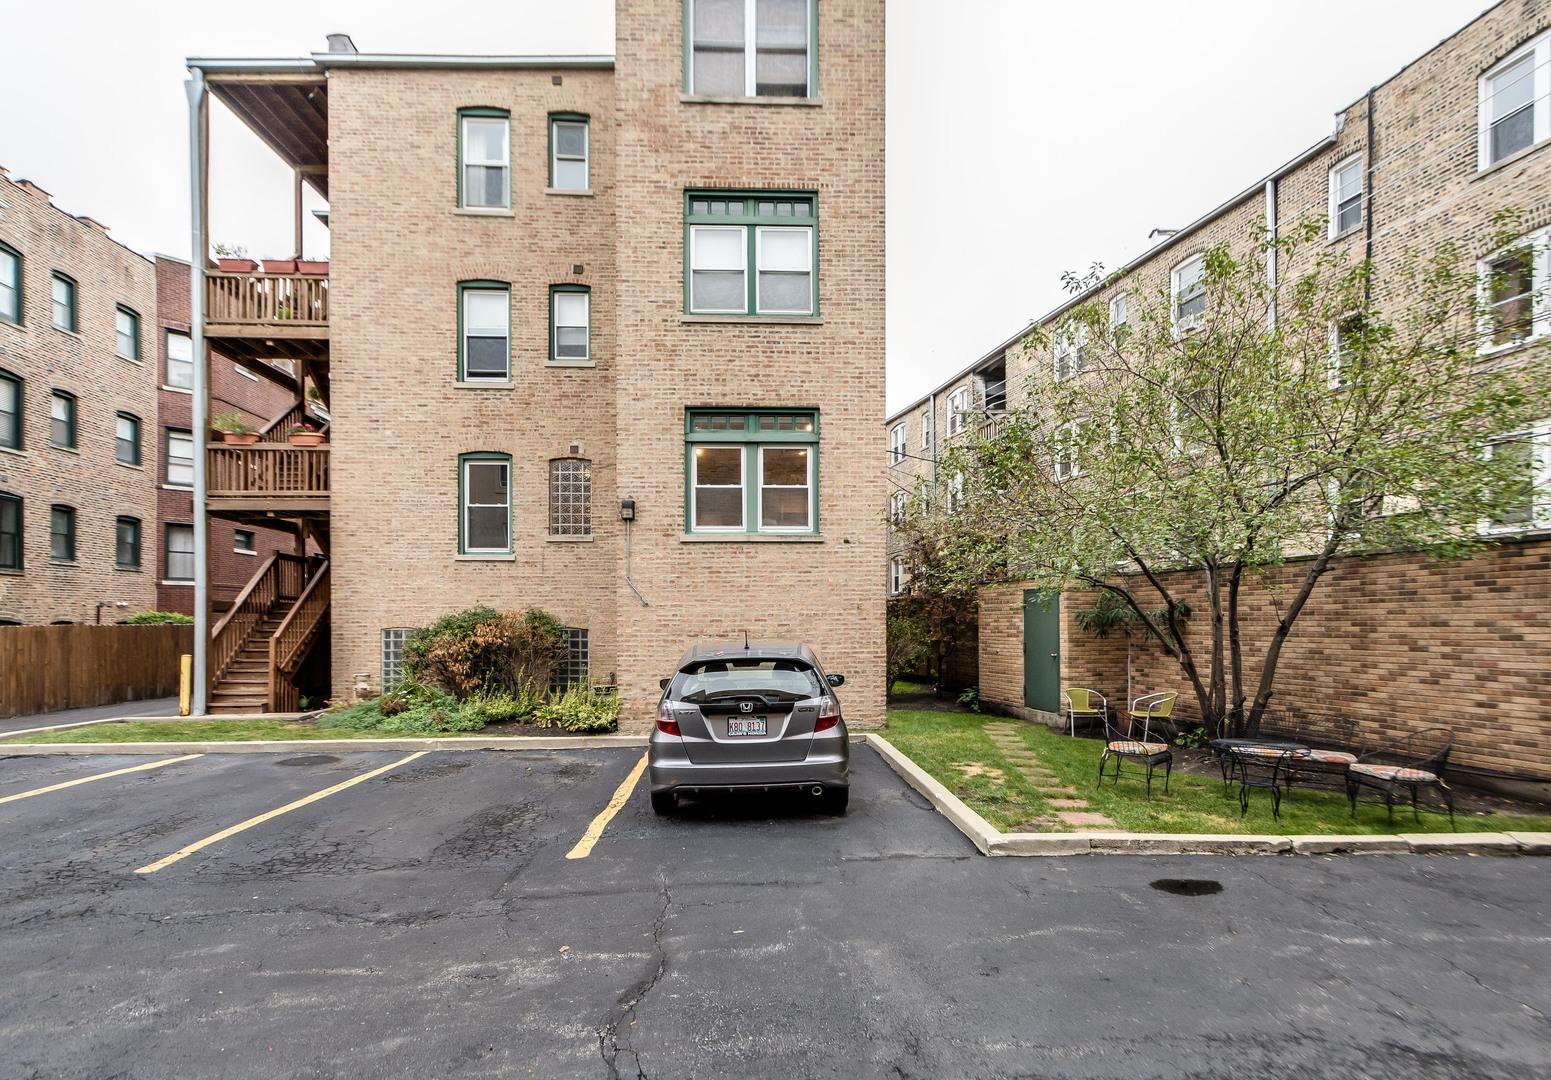 1317 Greenleaf Unit Unit p-3 ,Chicago, Illinois 60626